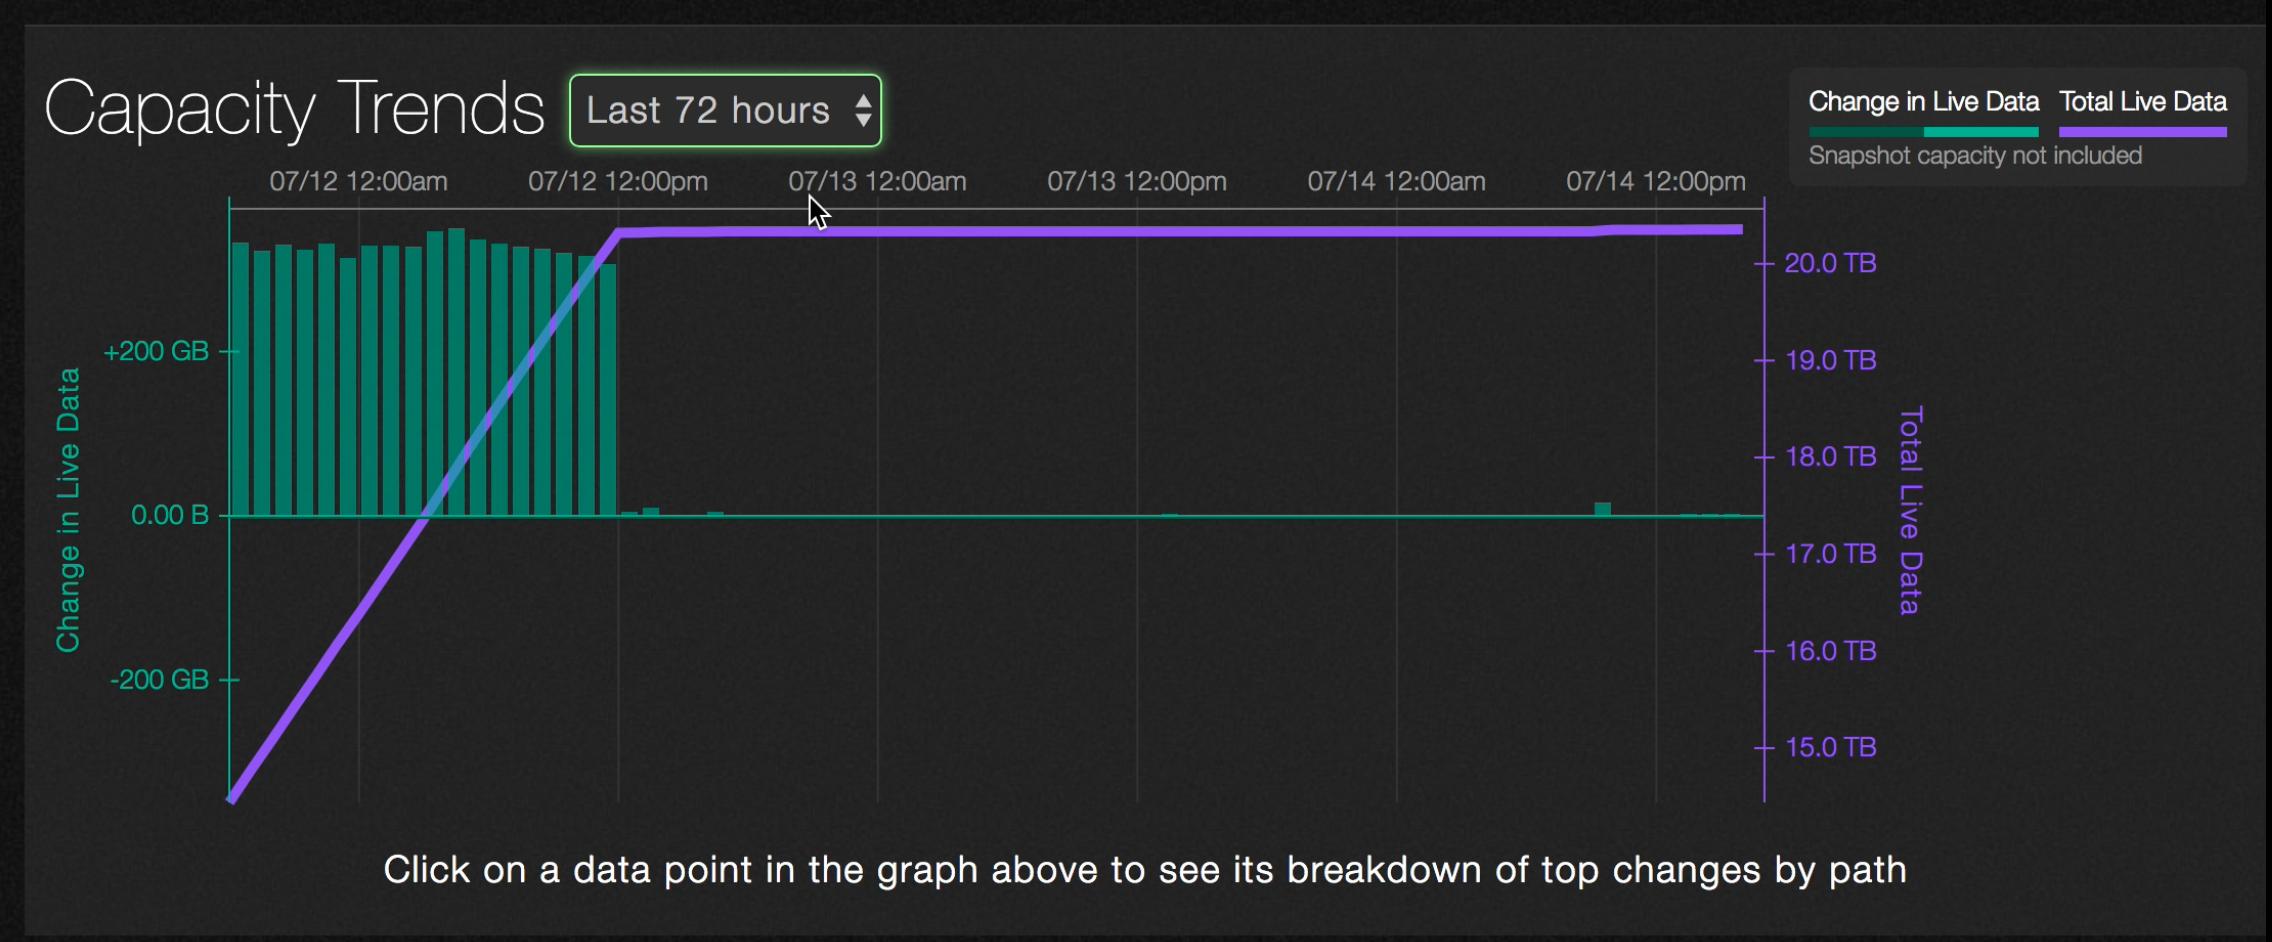 Capacity Trends last 72 hours